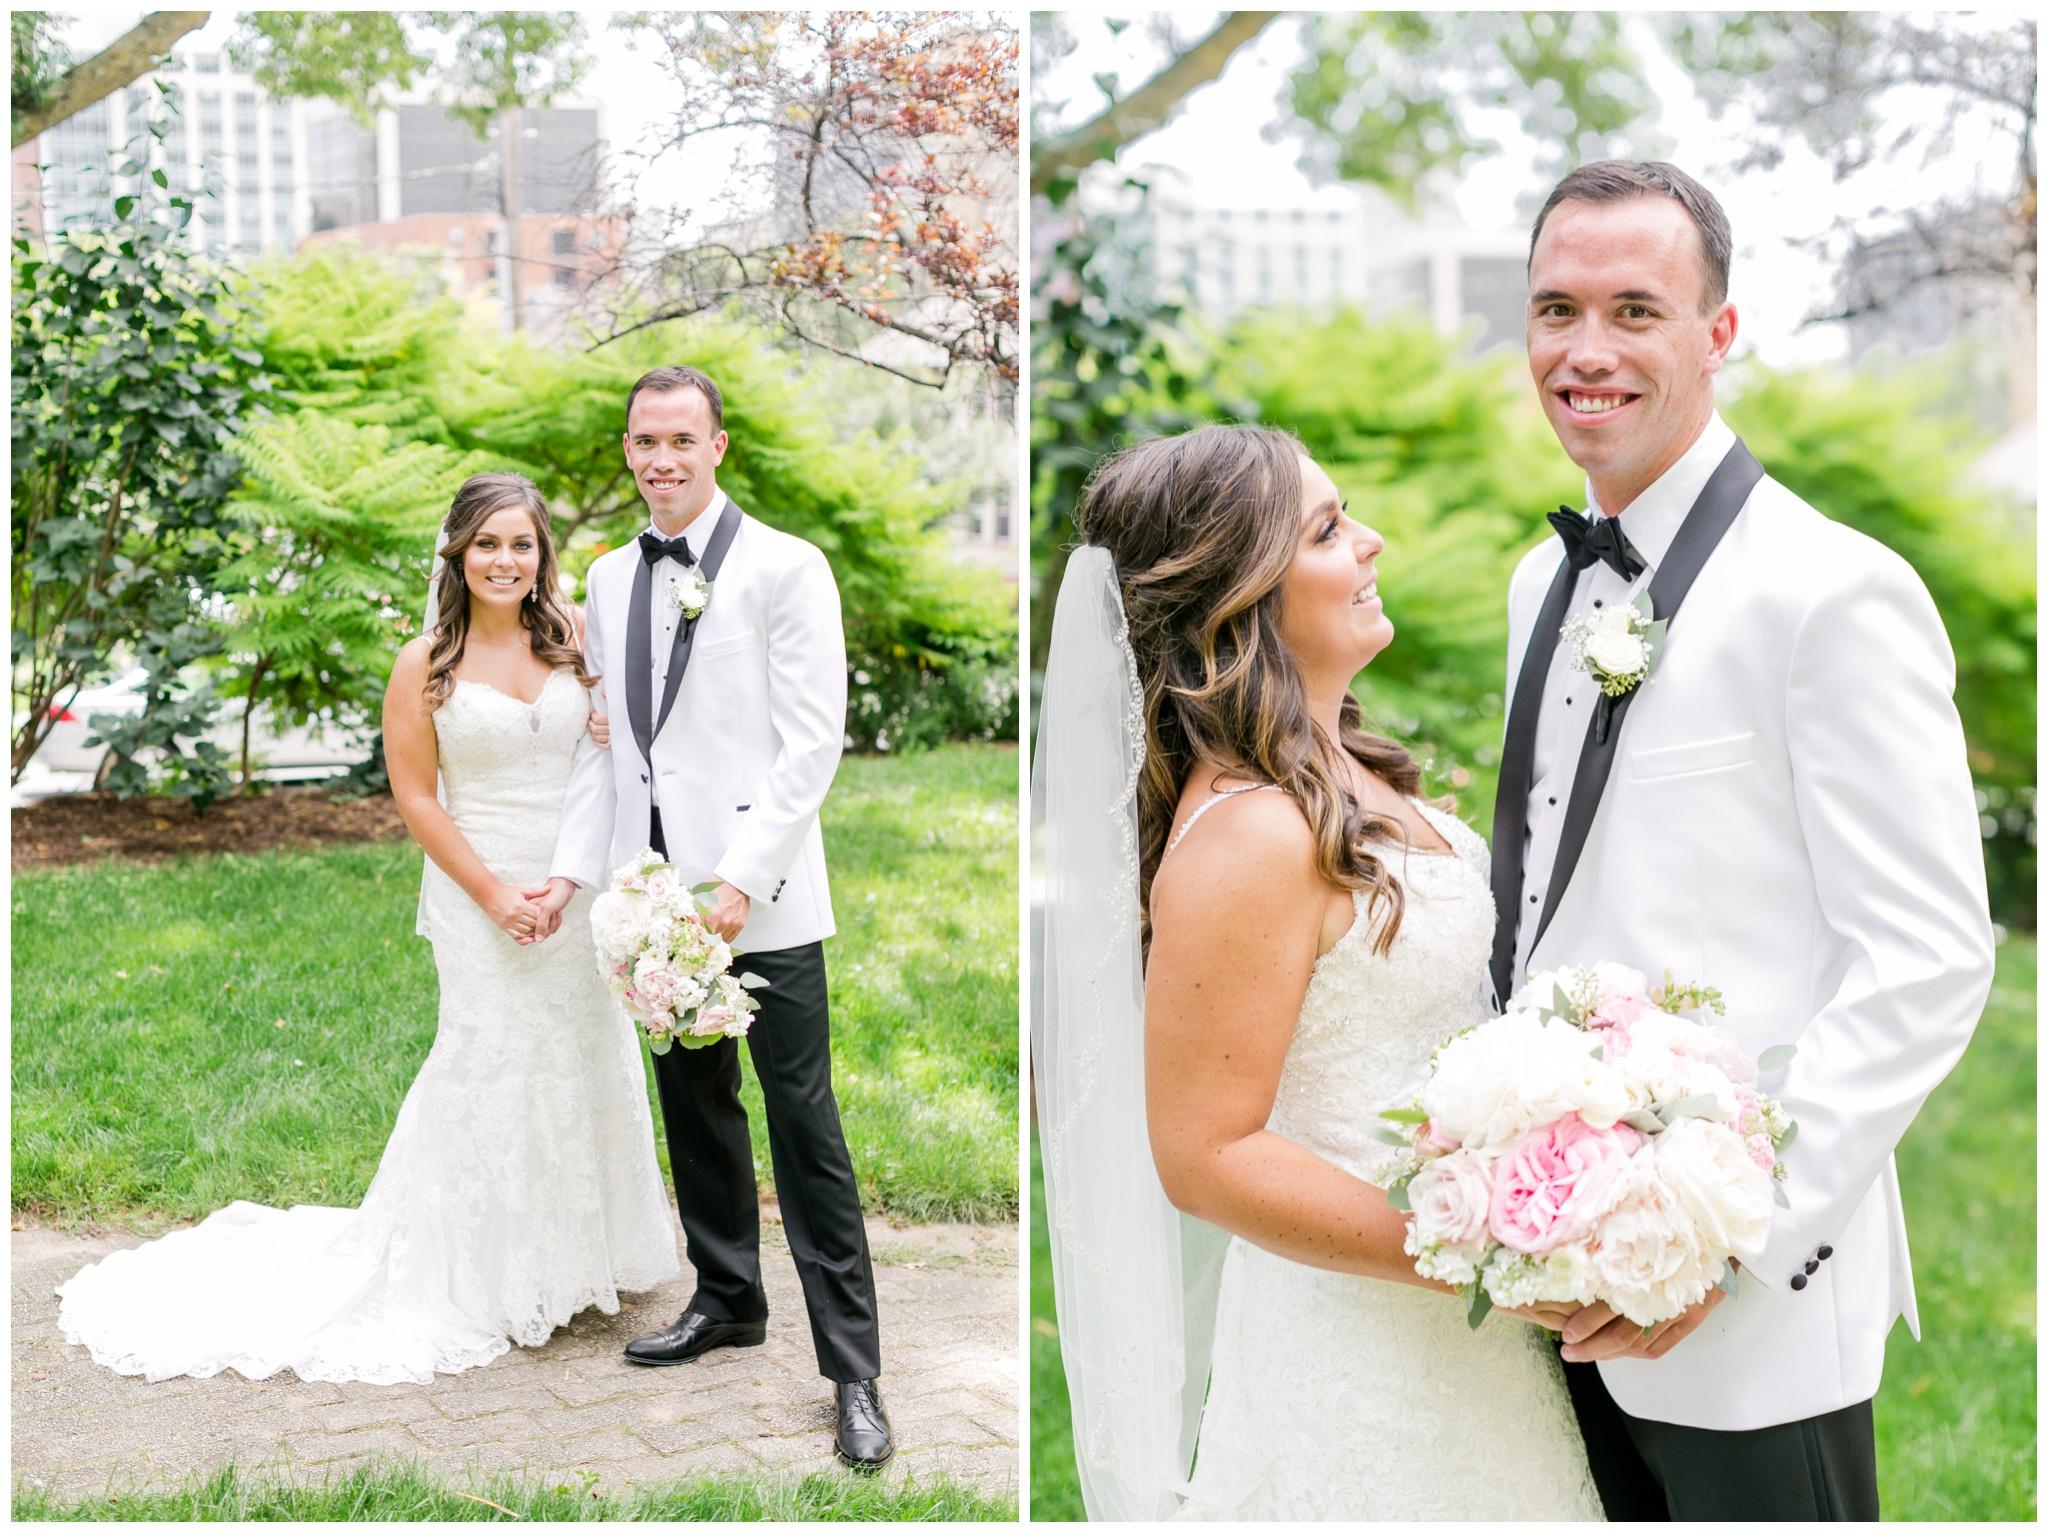 UW_Memorial_Union_wedding_madison_wisconsin_wedding_photographers_4599.jpg